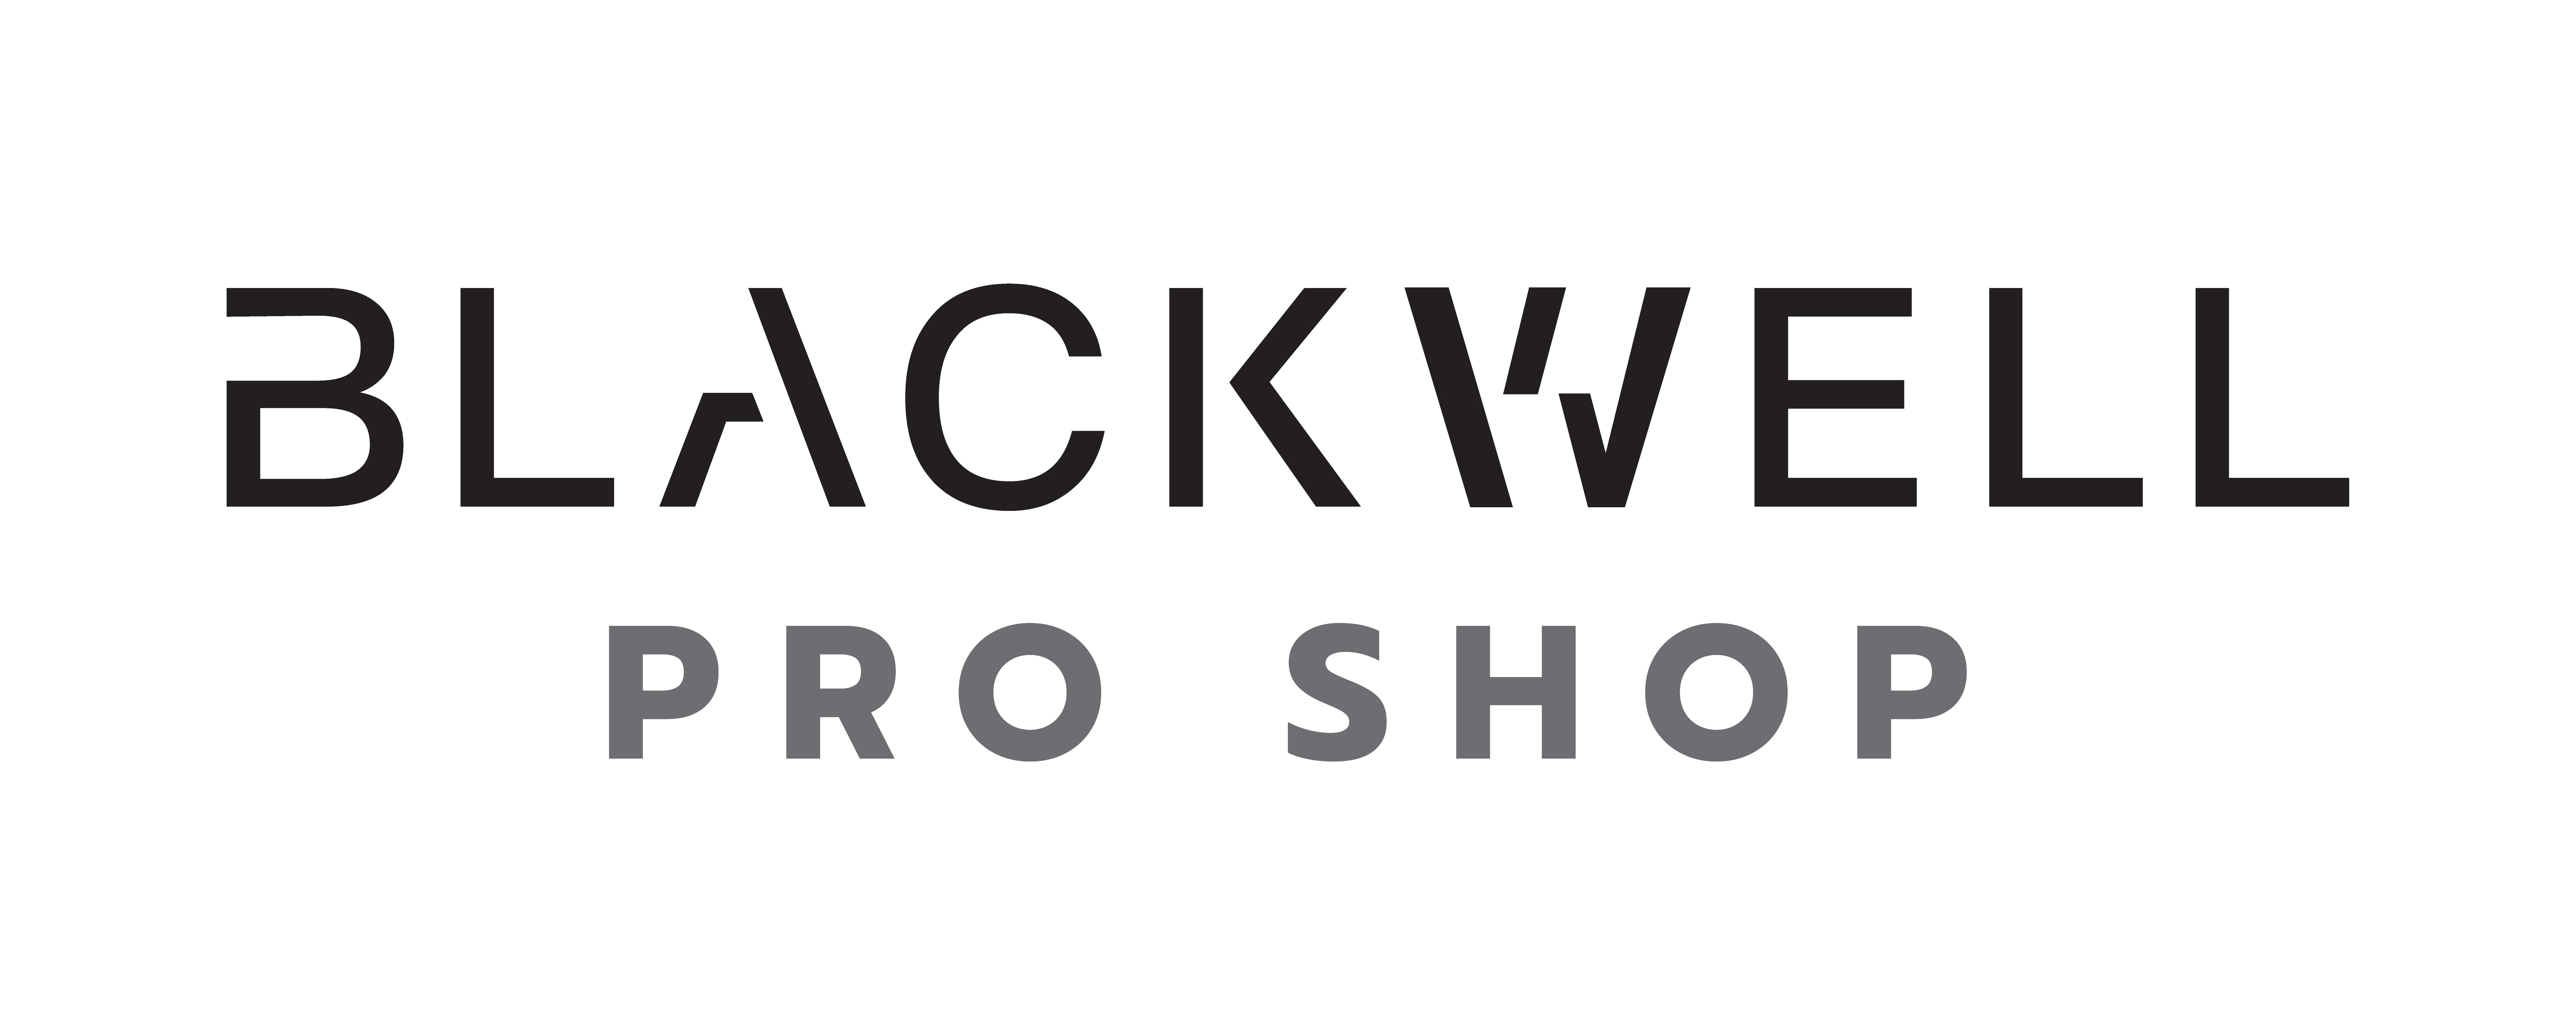 Blackwell Pro Shop